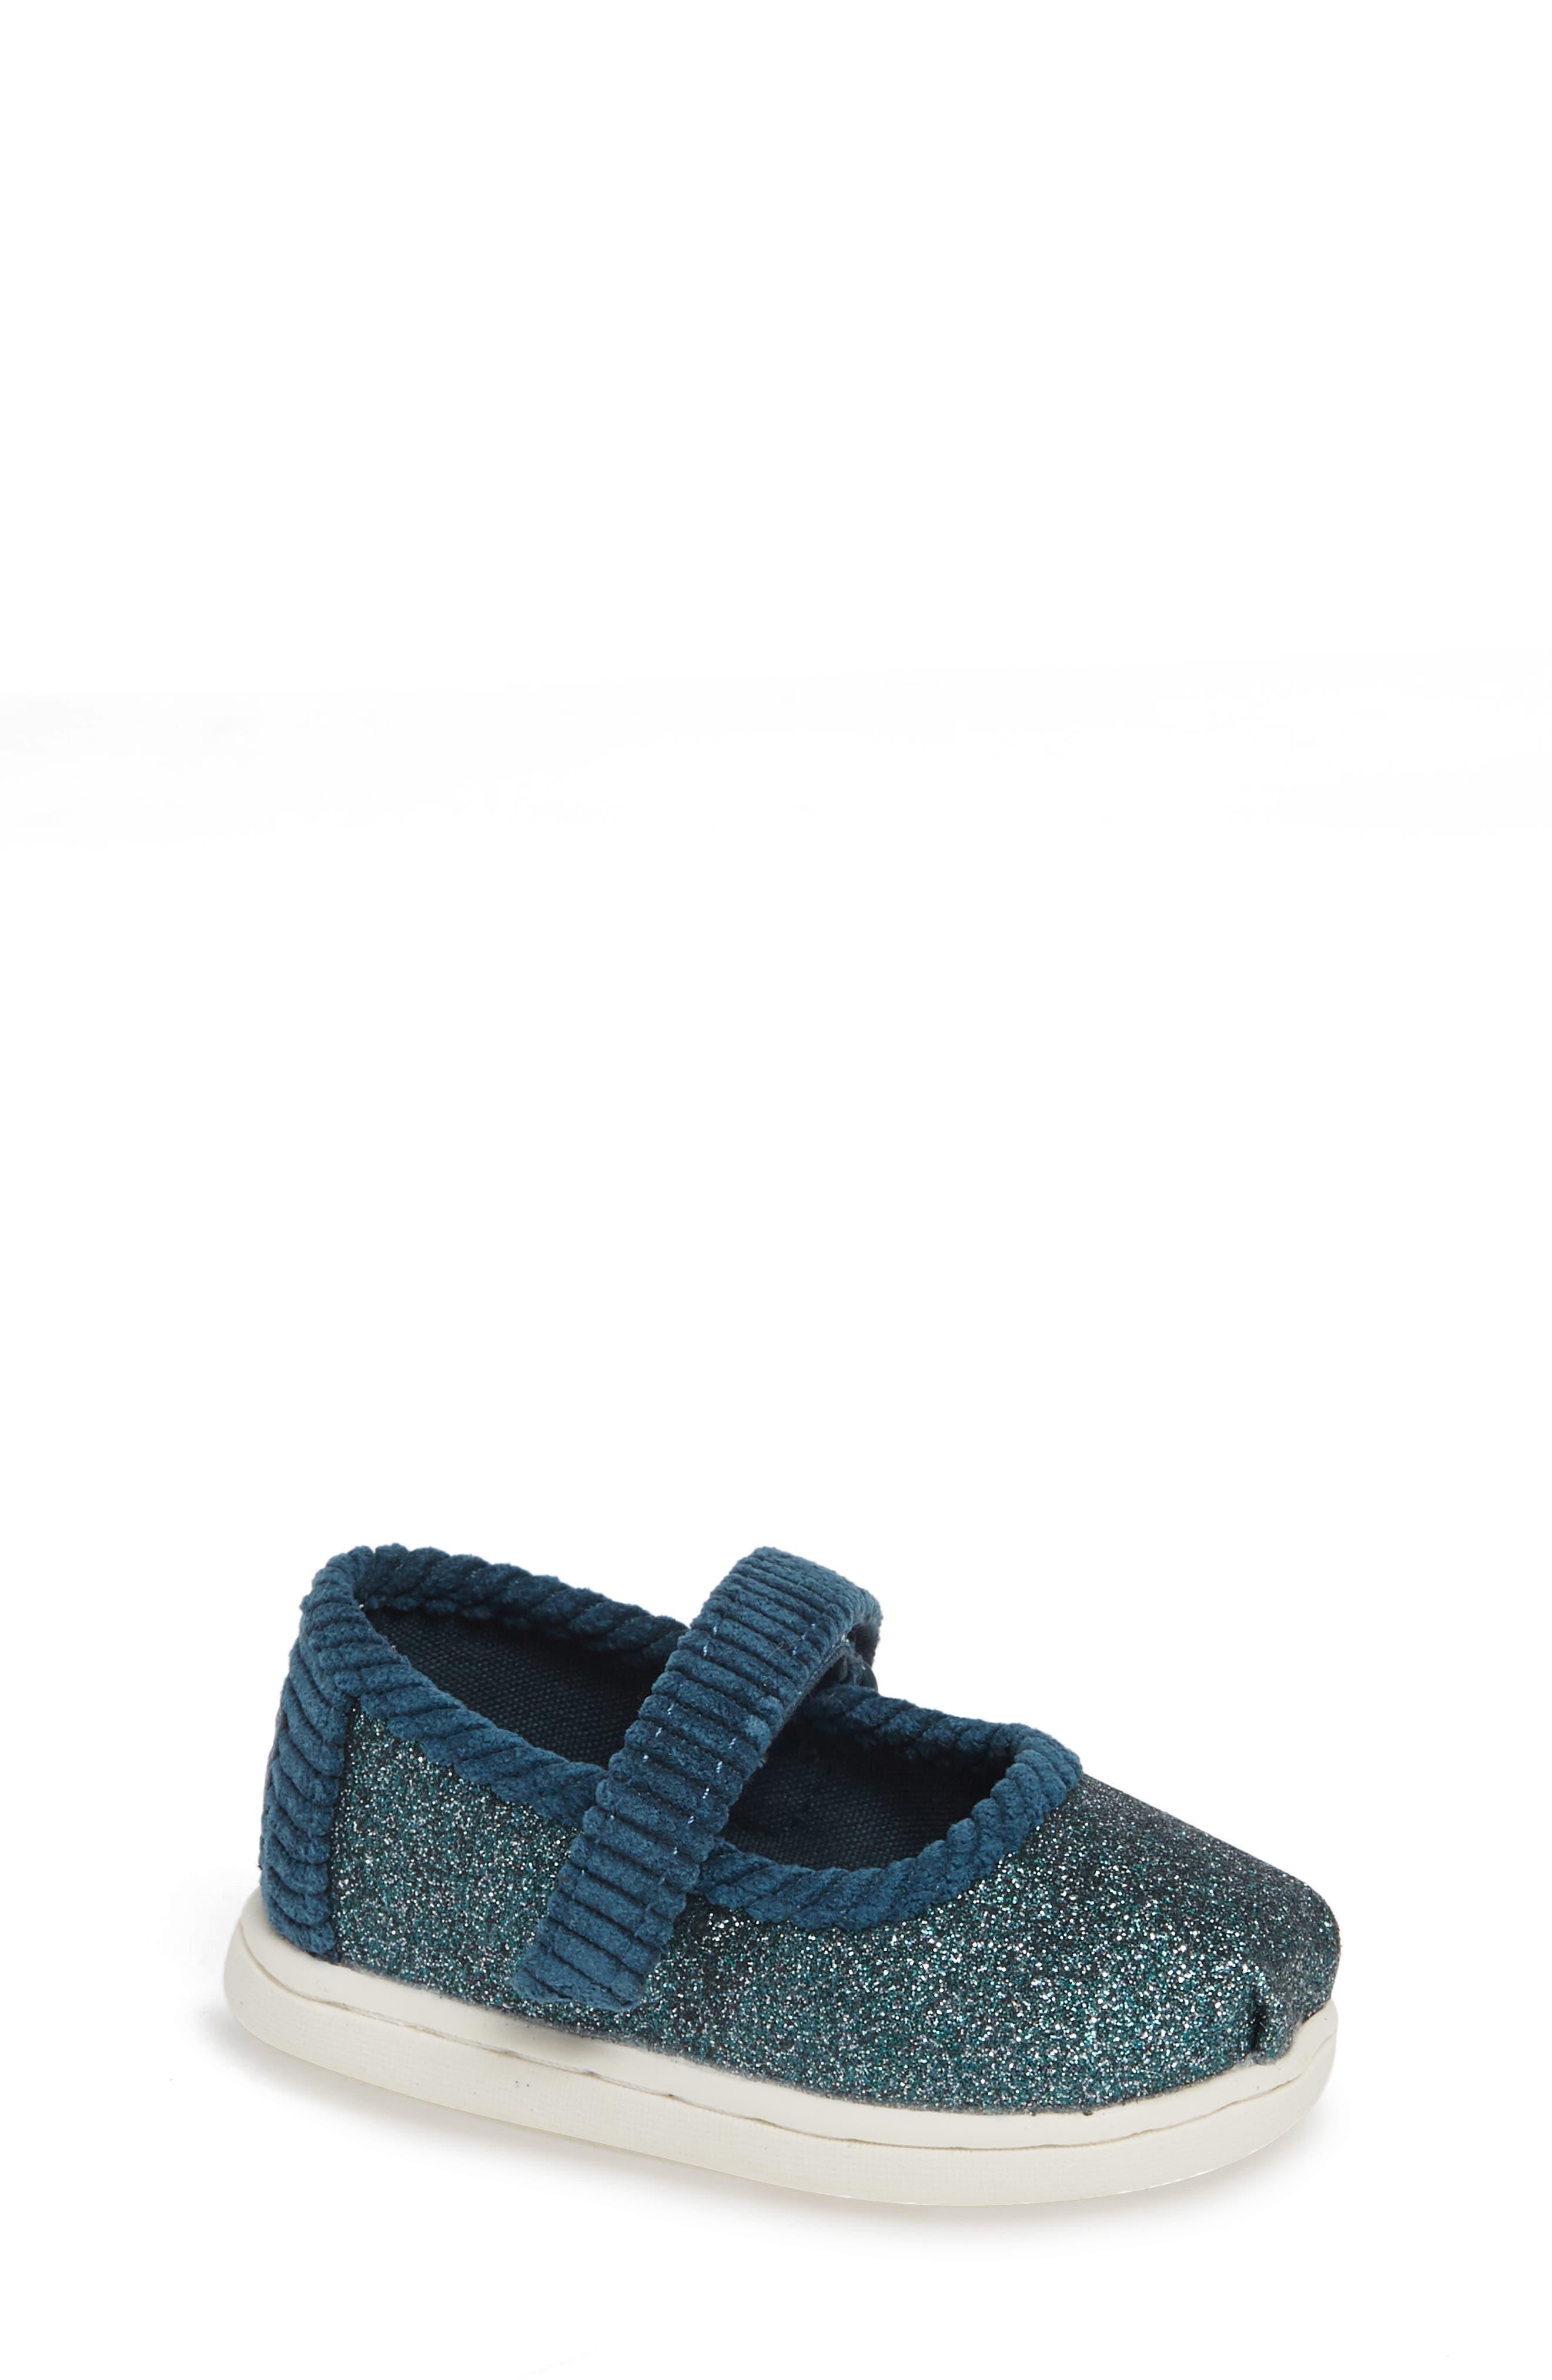 Mary Jane Sneaker,                         Main,                         color, ATLANTIC IRIDESCENT/ CORDUROY